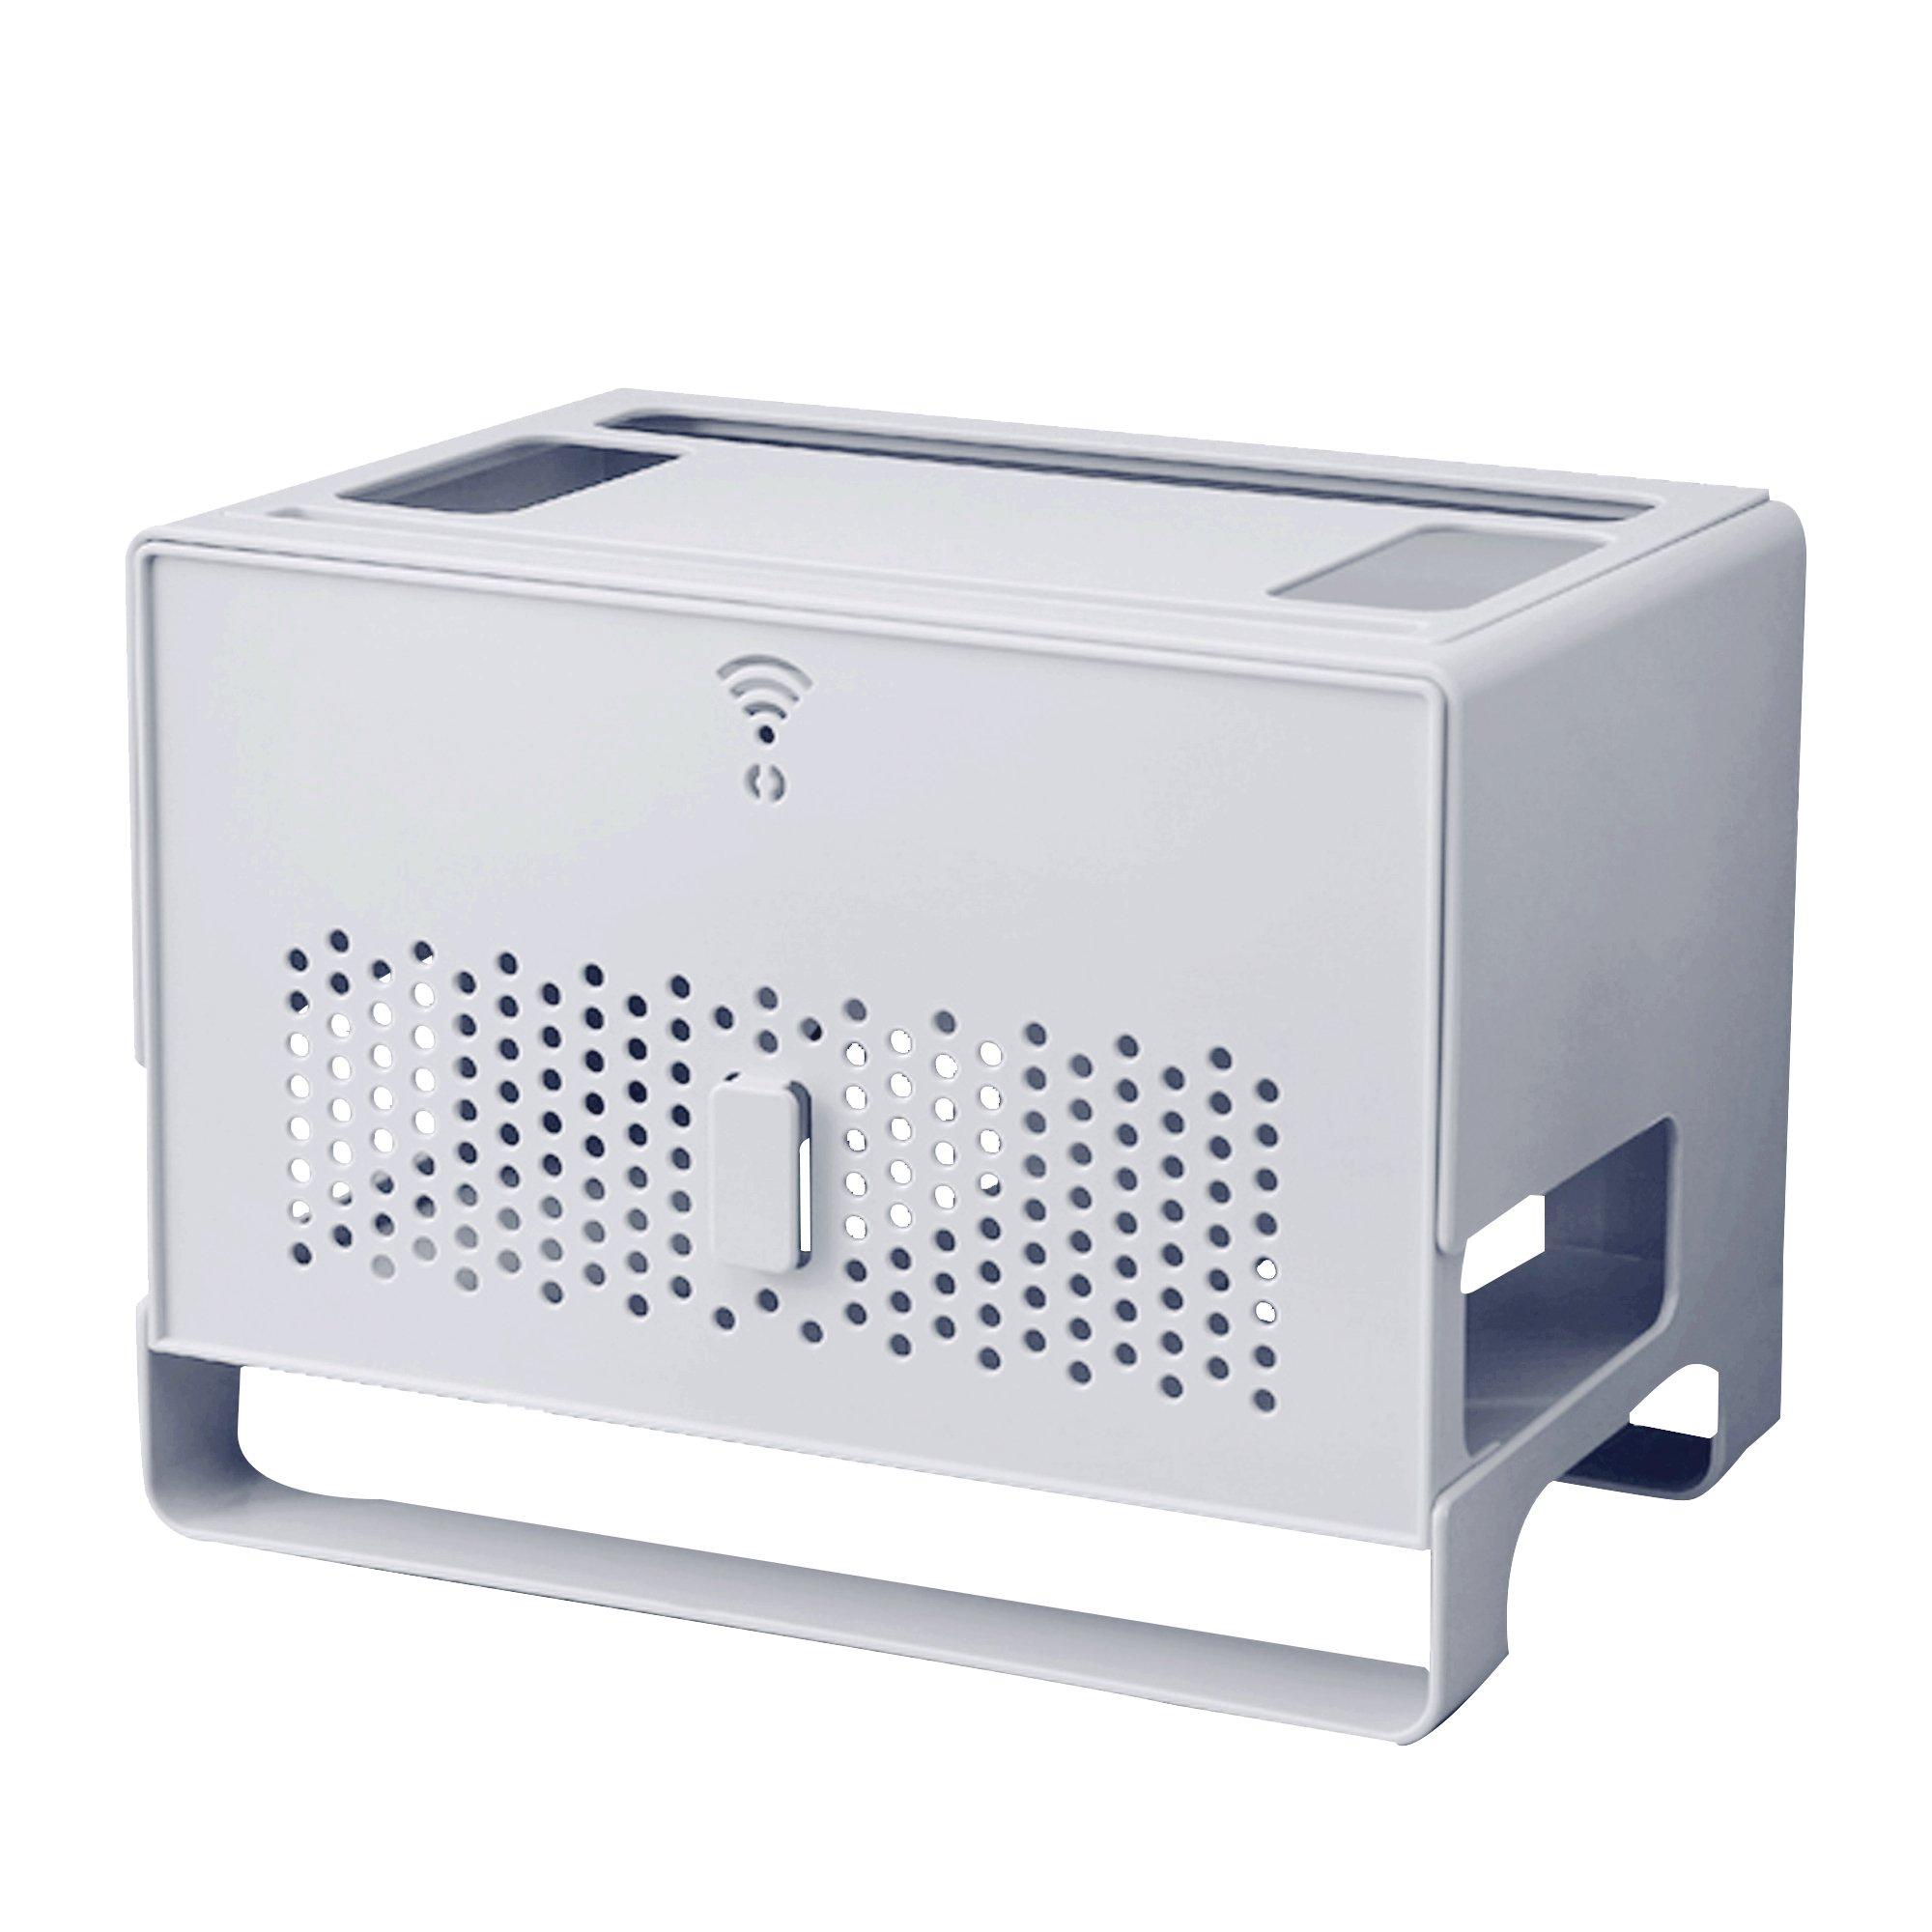 2 Tier WIFI router Extension Cord Organizer